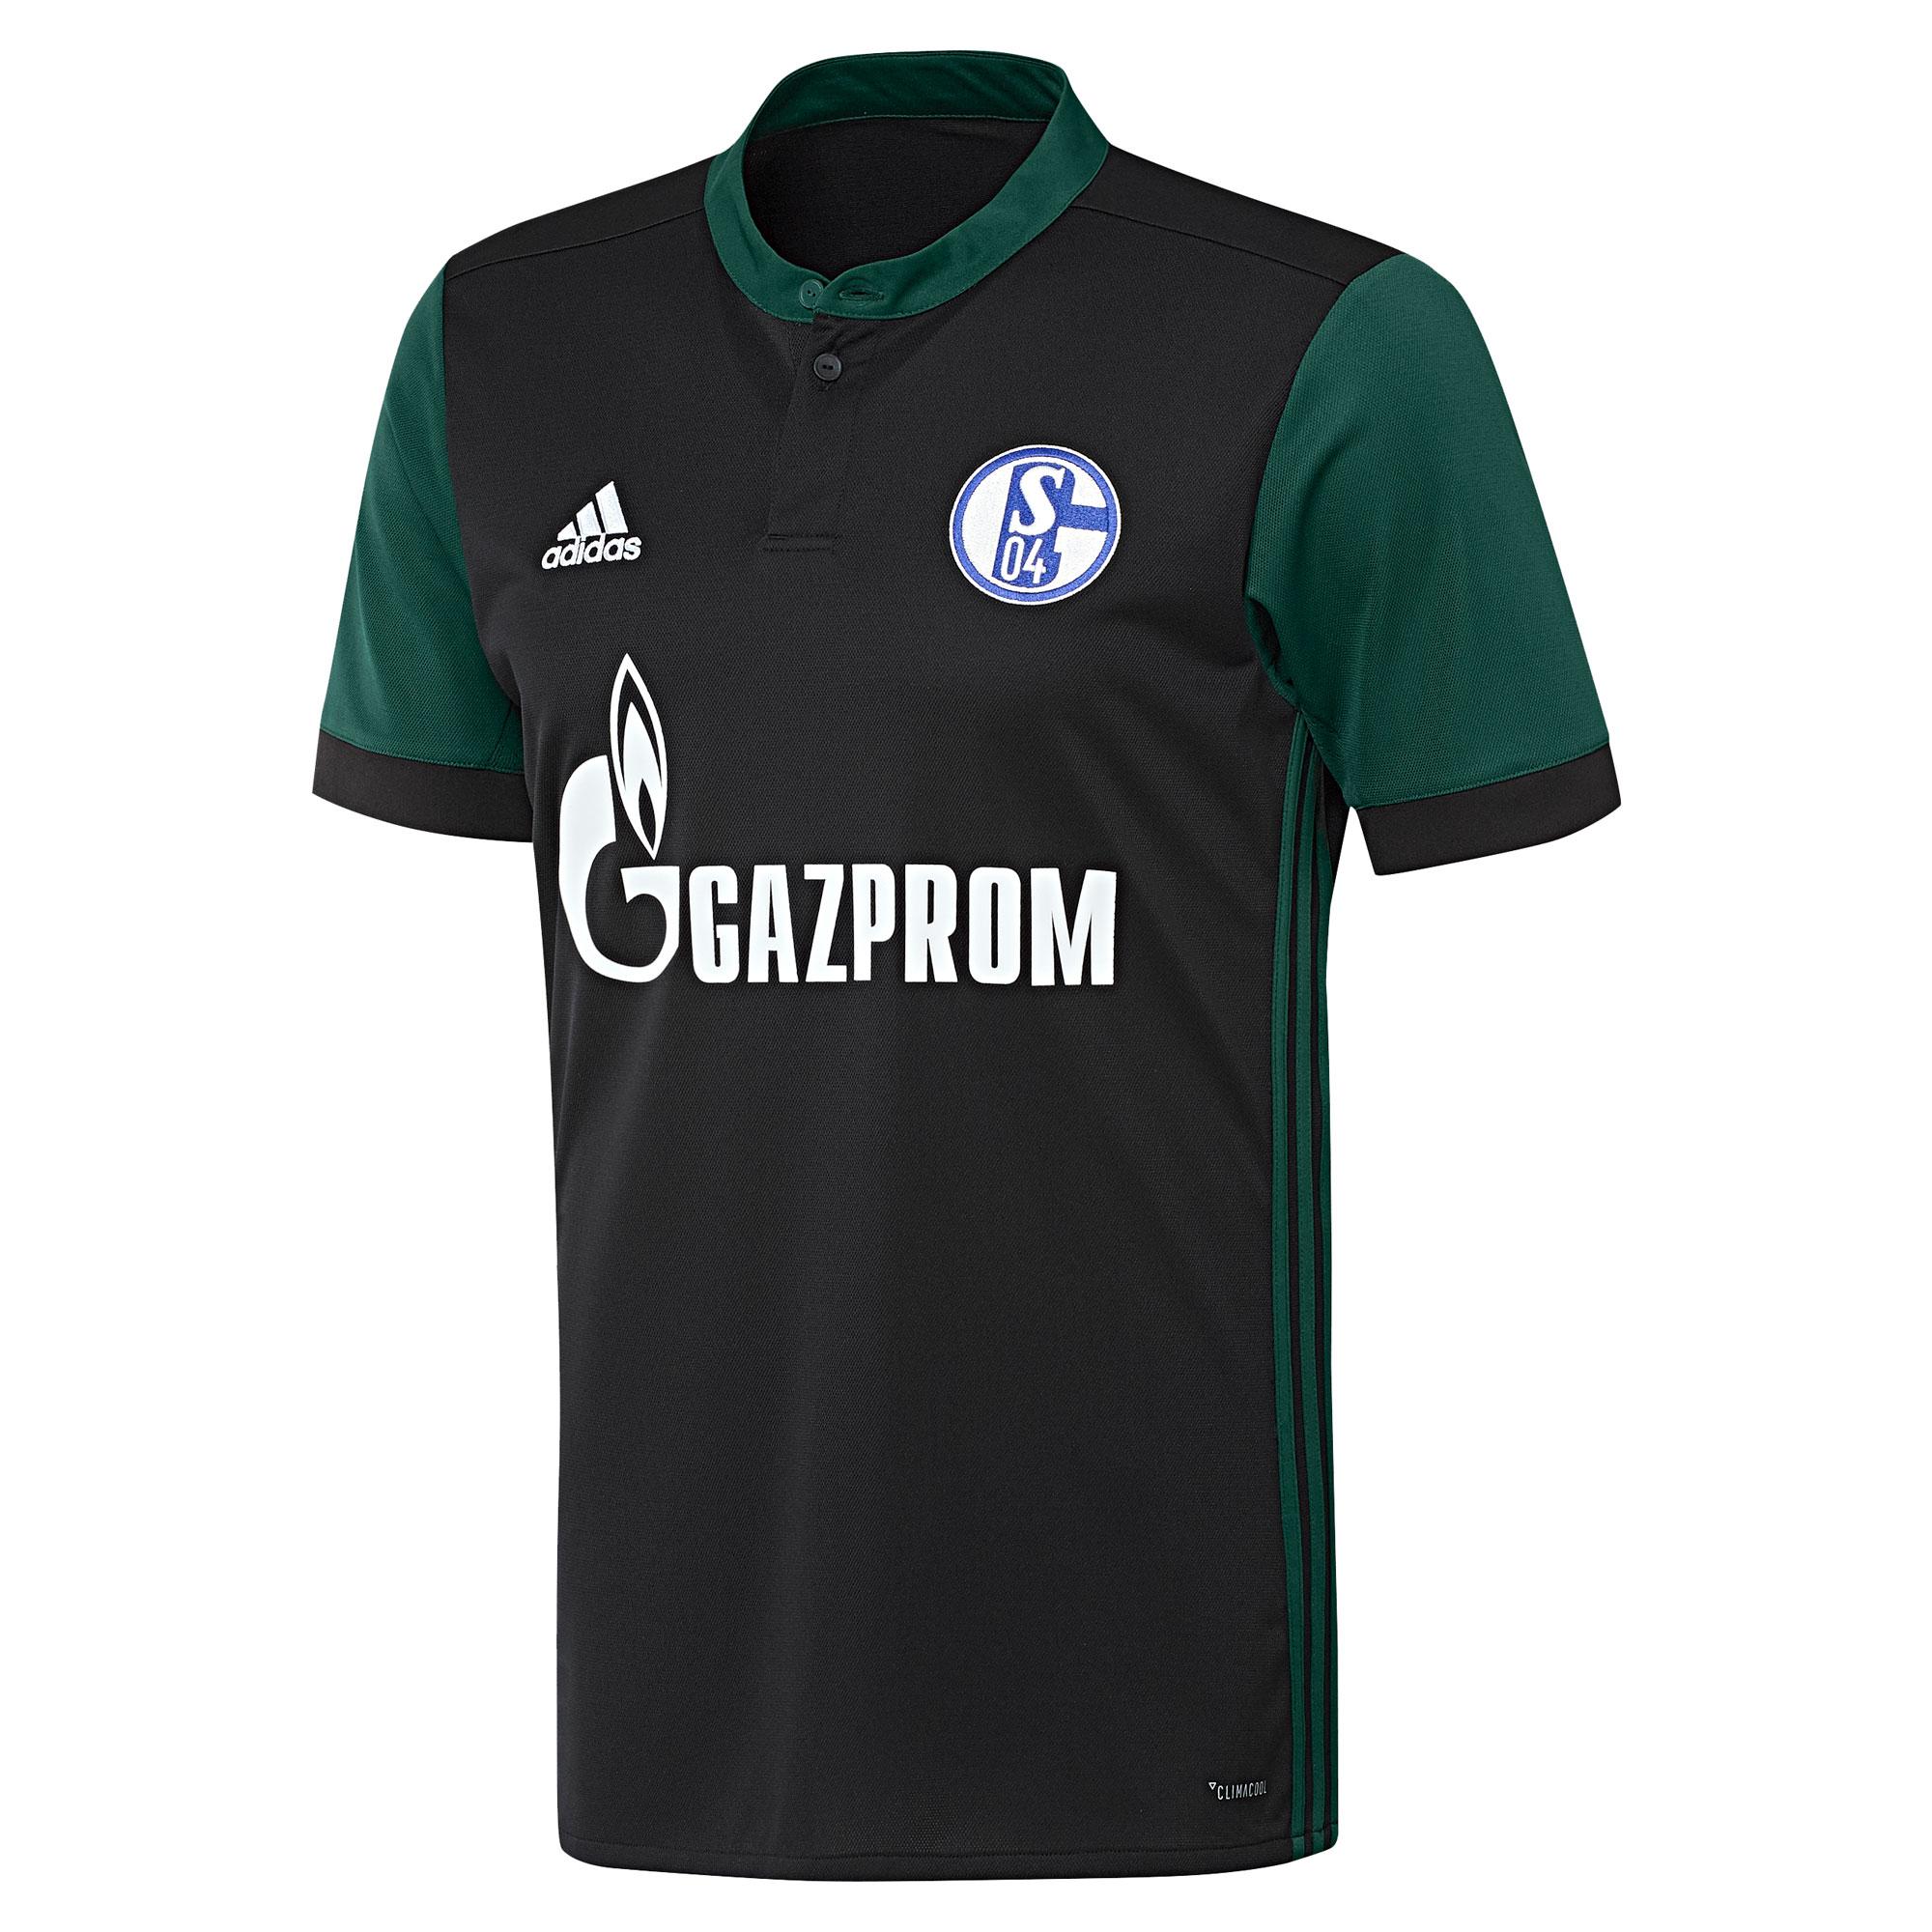 Schalke 04 2017-18 Adidas Third Kit | 17/18 Kits | Football shirt blog